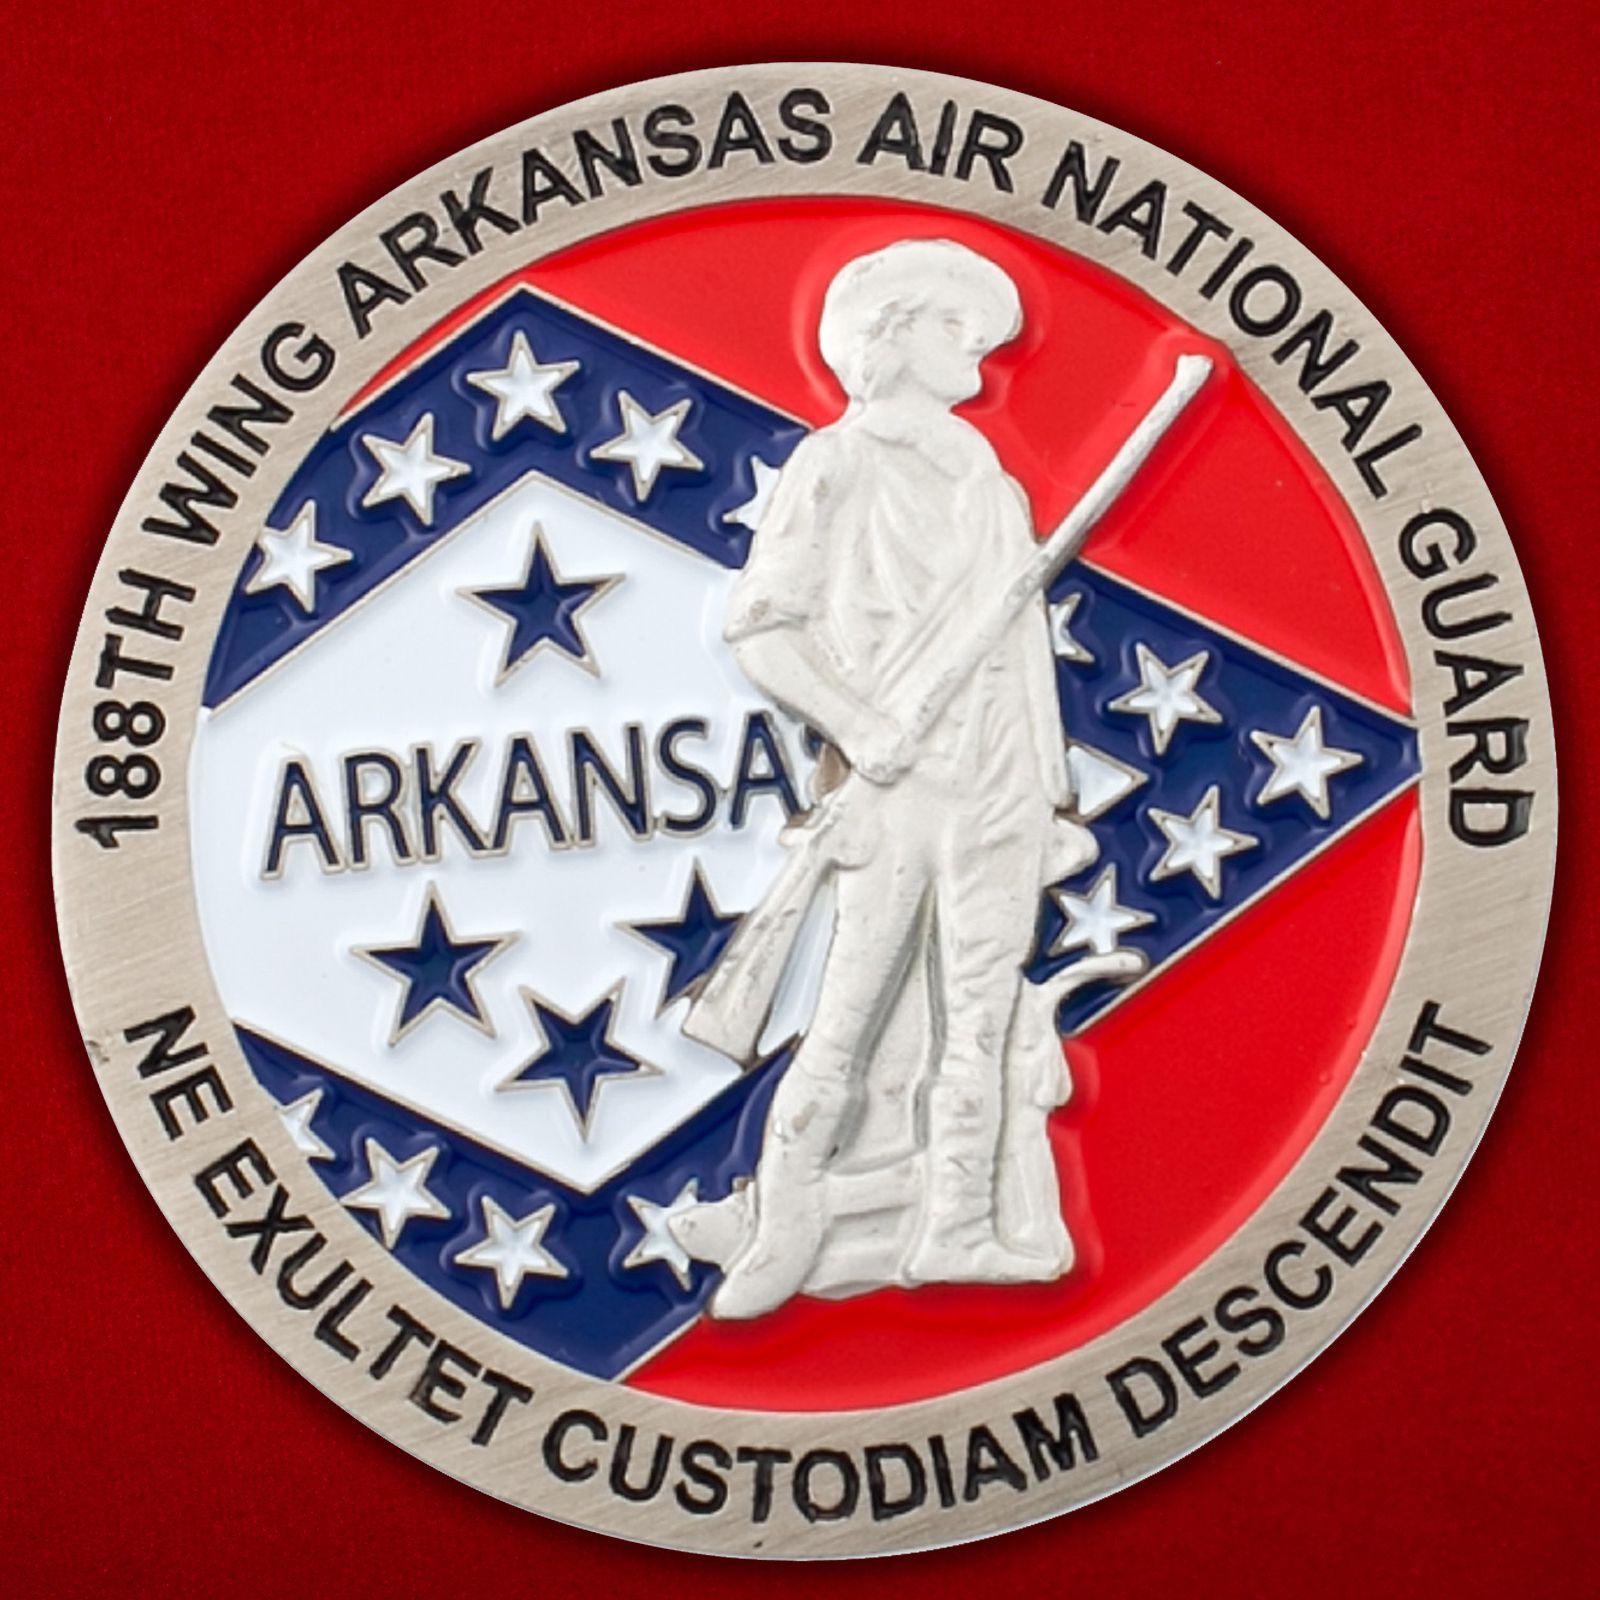 Челлендж коин 188 крыла авиации Национальной гвардии США (Арканзас)